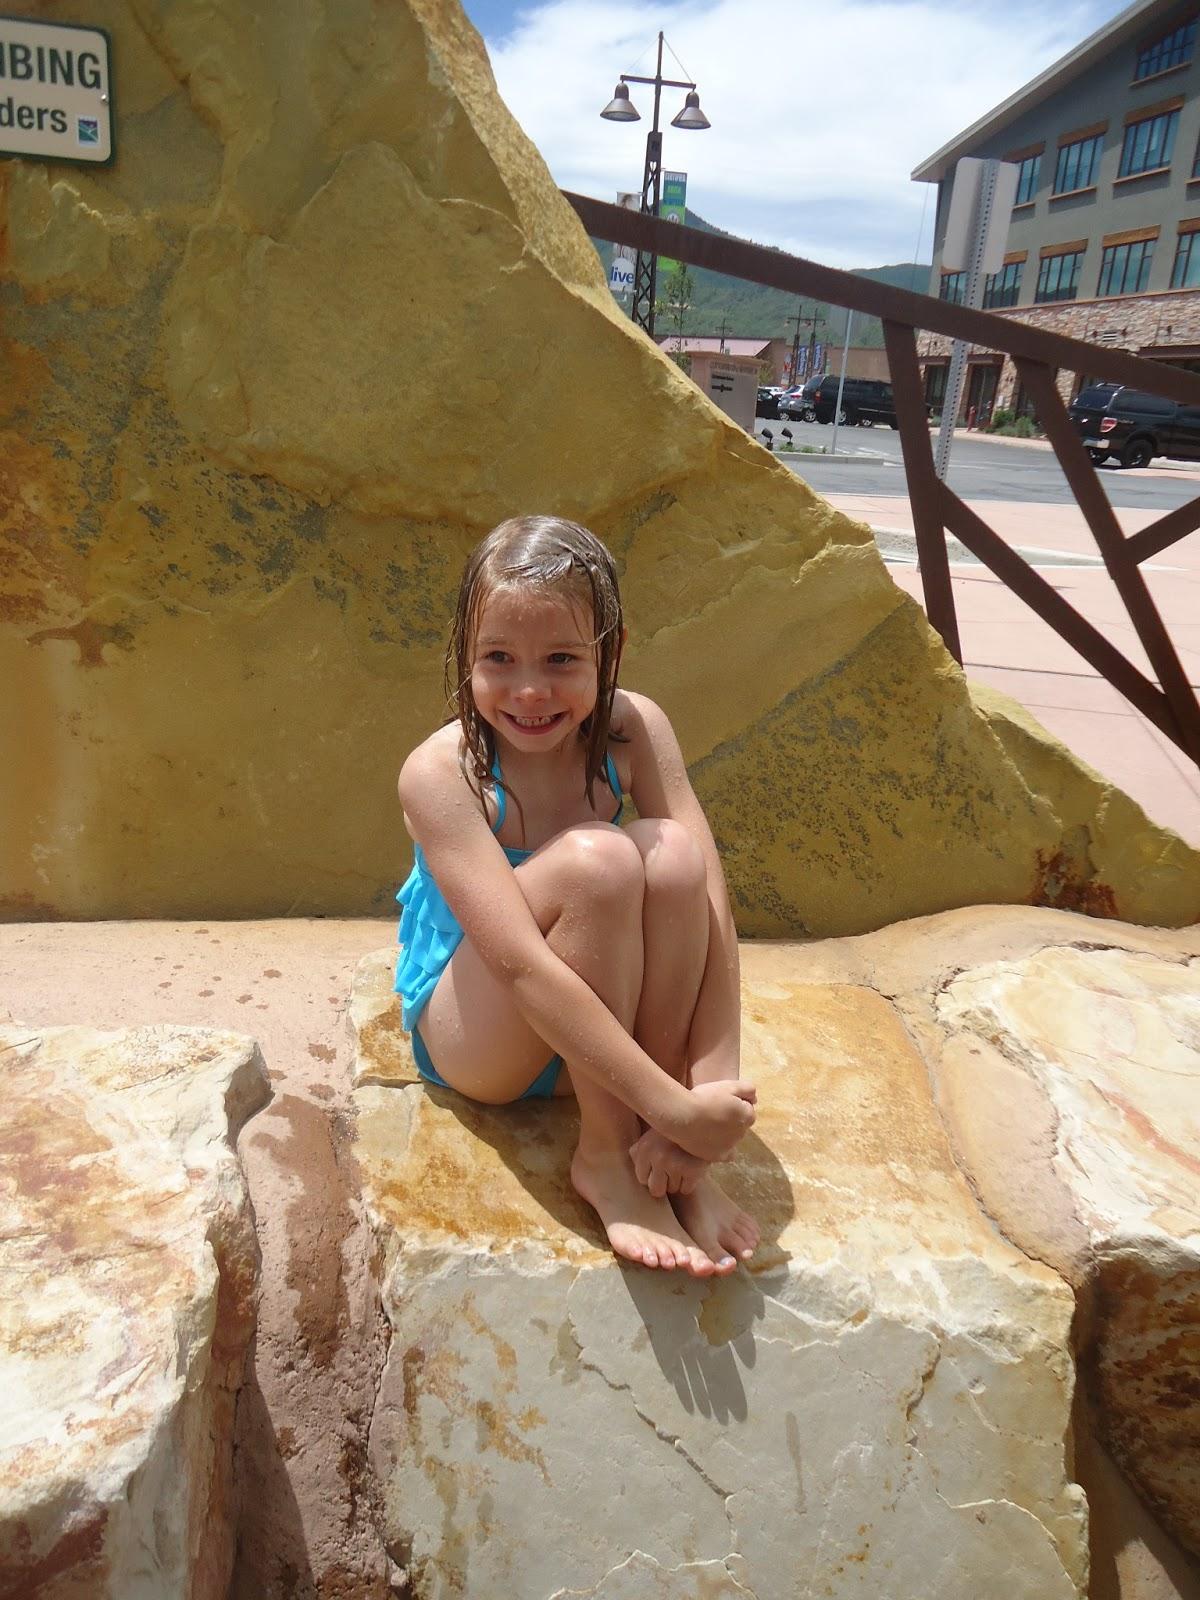 Cline S Corner Park City Splash Pad With The Hurst Girls